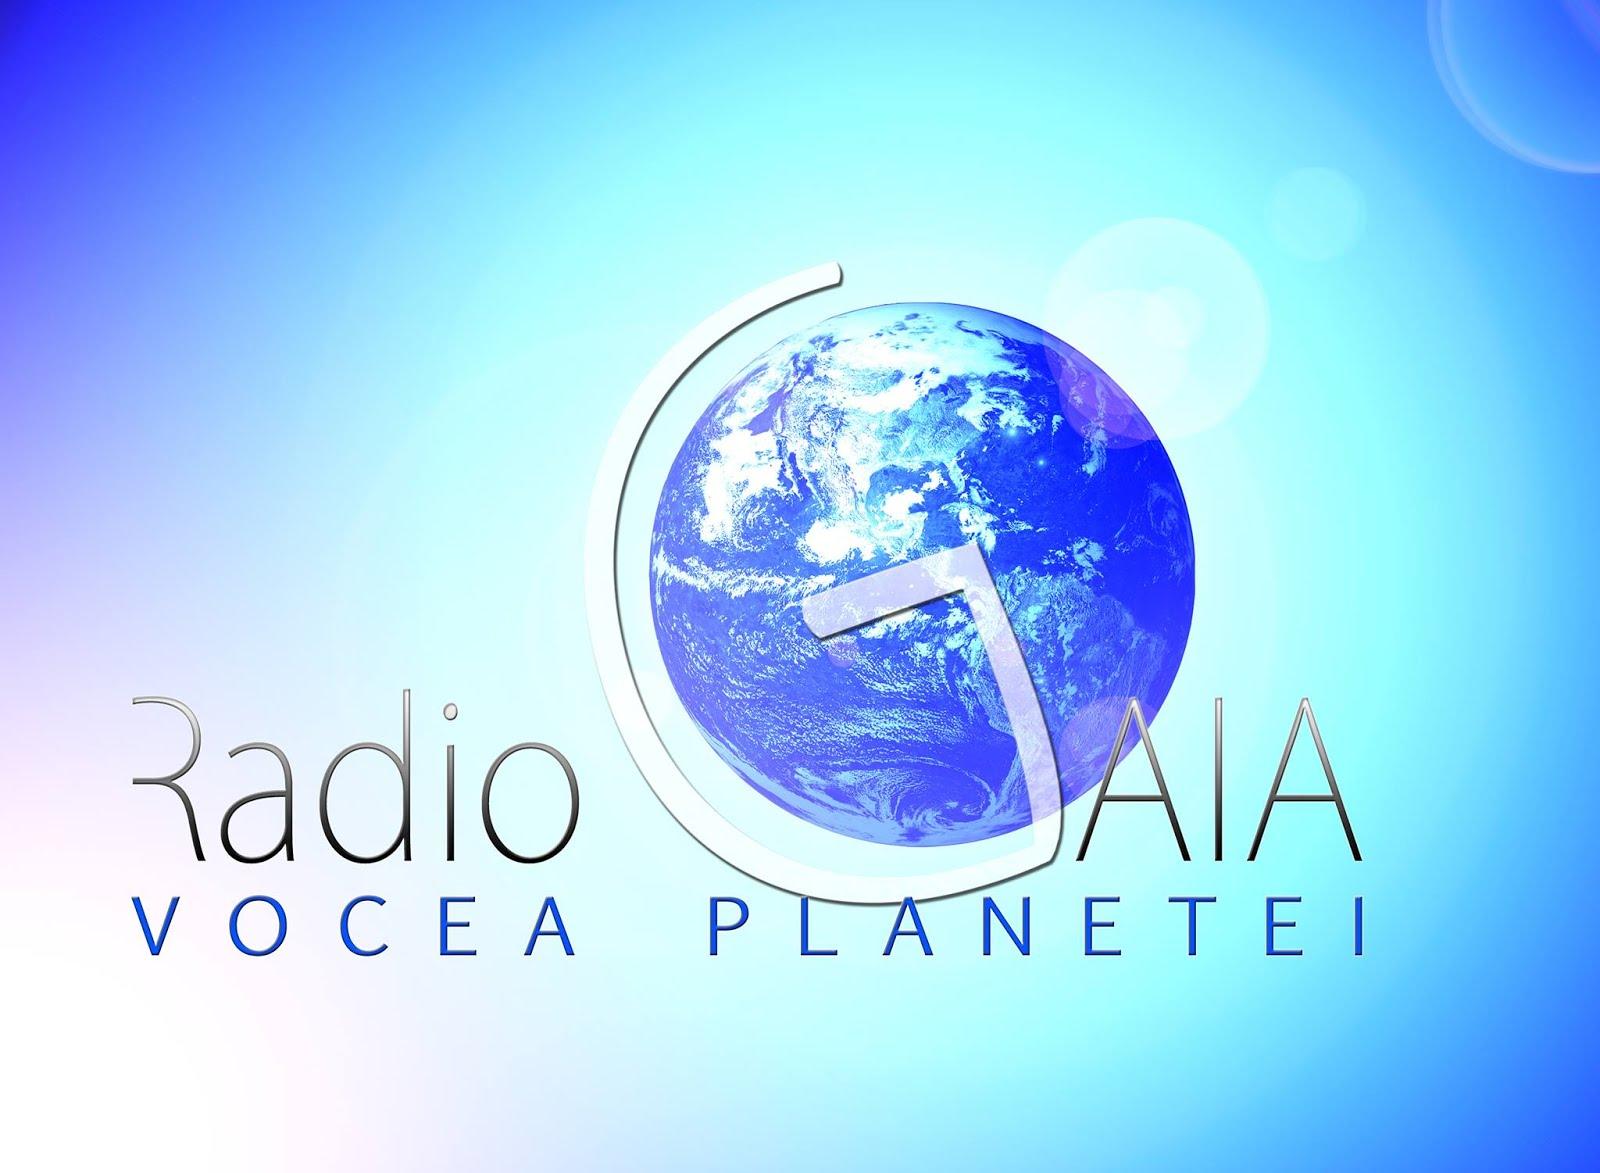 Asculta Vocea Planetei!